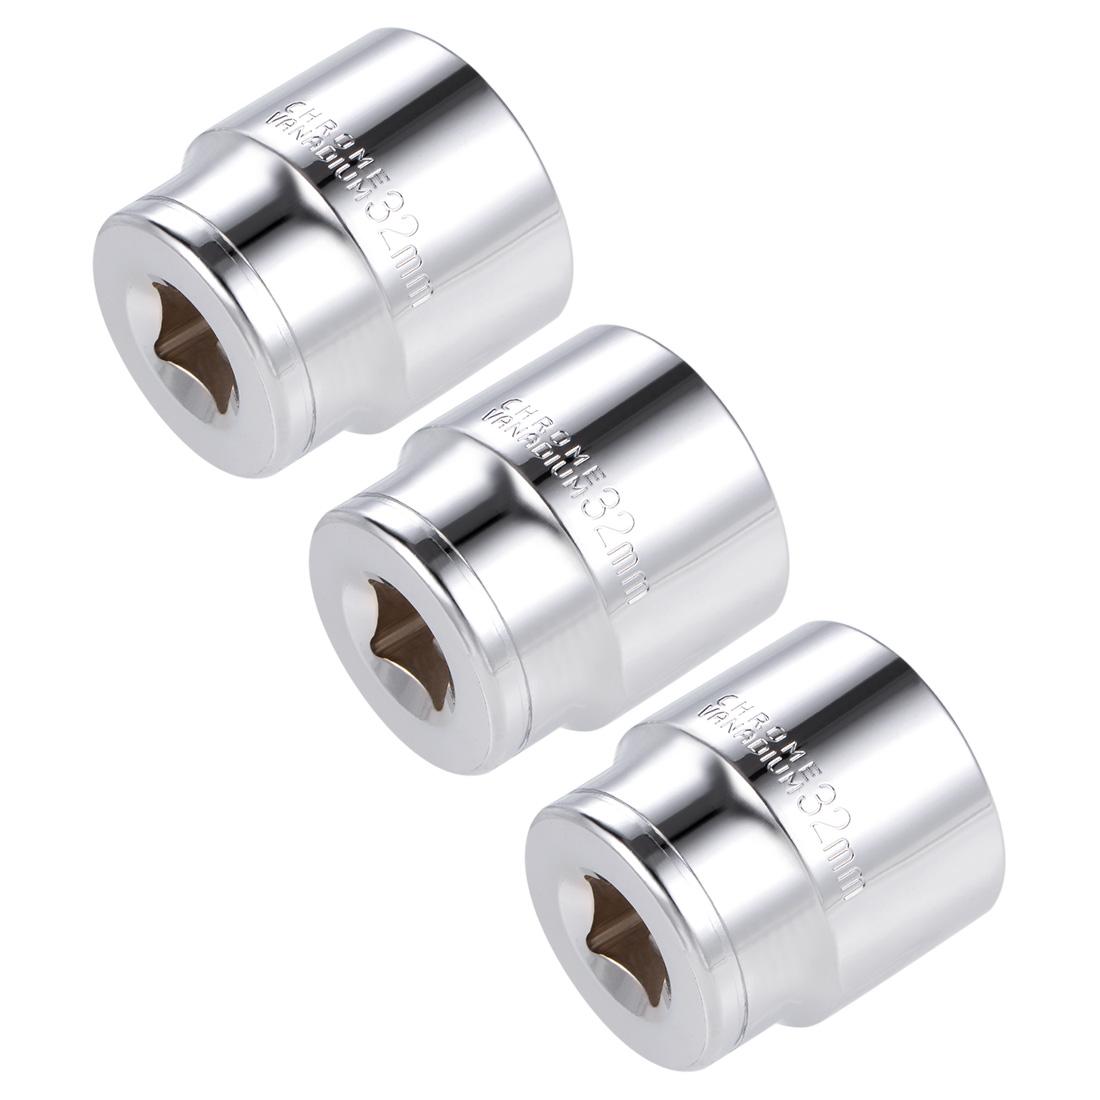 1/2-inch Drive E32 Universal Spline Socket Shallow 12 Point Cr-V Steel 3 pcs